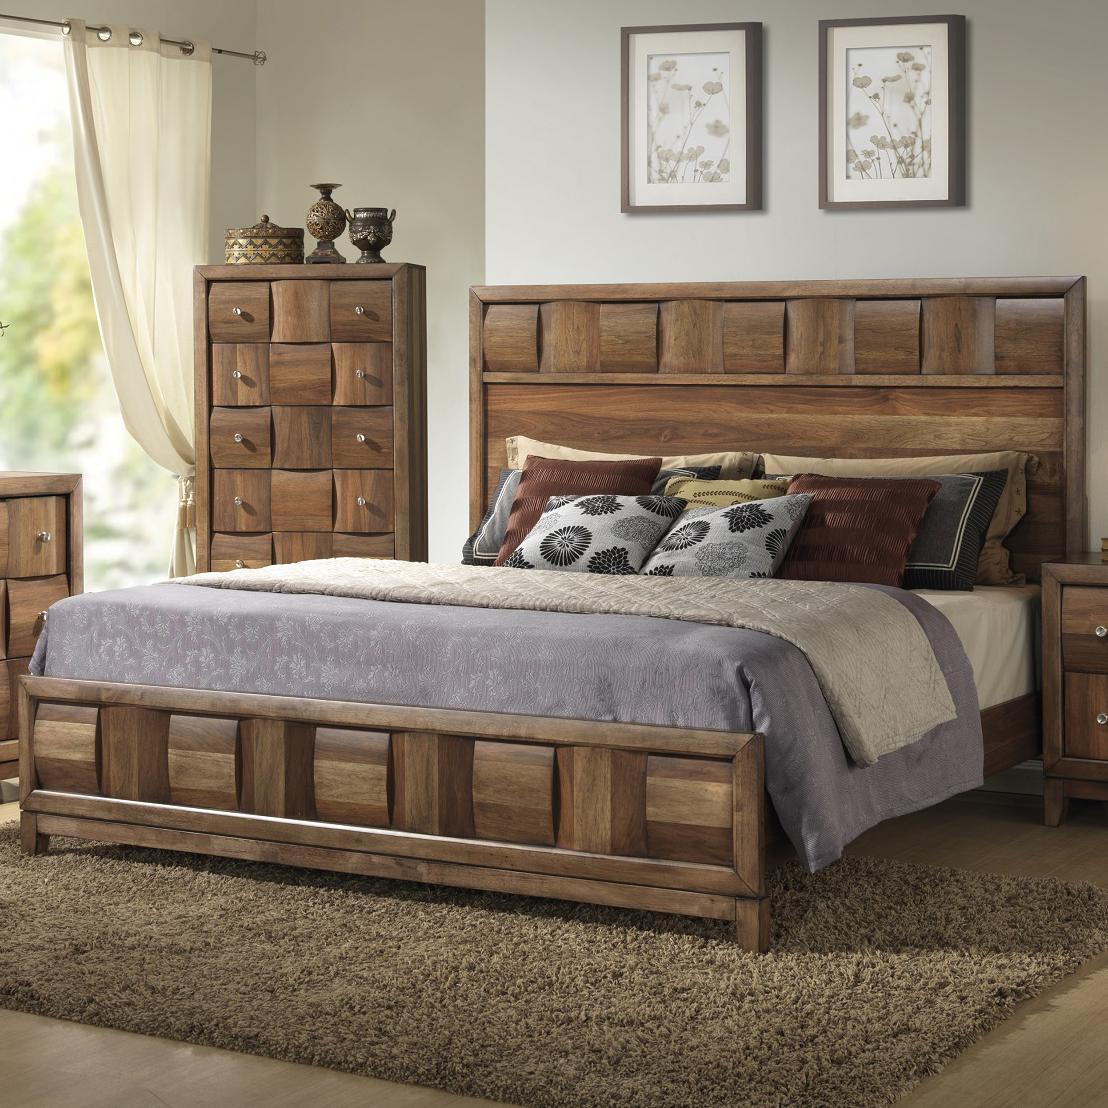 Lifestyle Furniture Bedroom Sets Lifestyle Bedroom Furniture Photo 2 Of 10 Marvelous Lifestyle